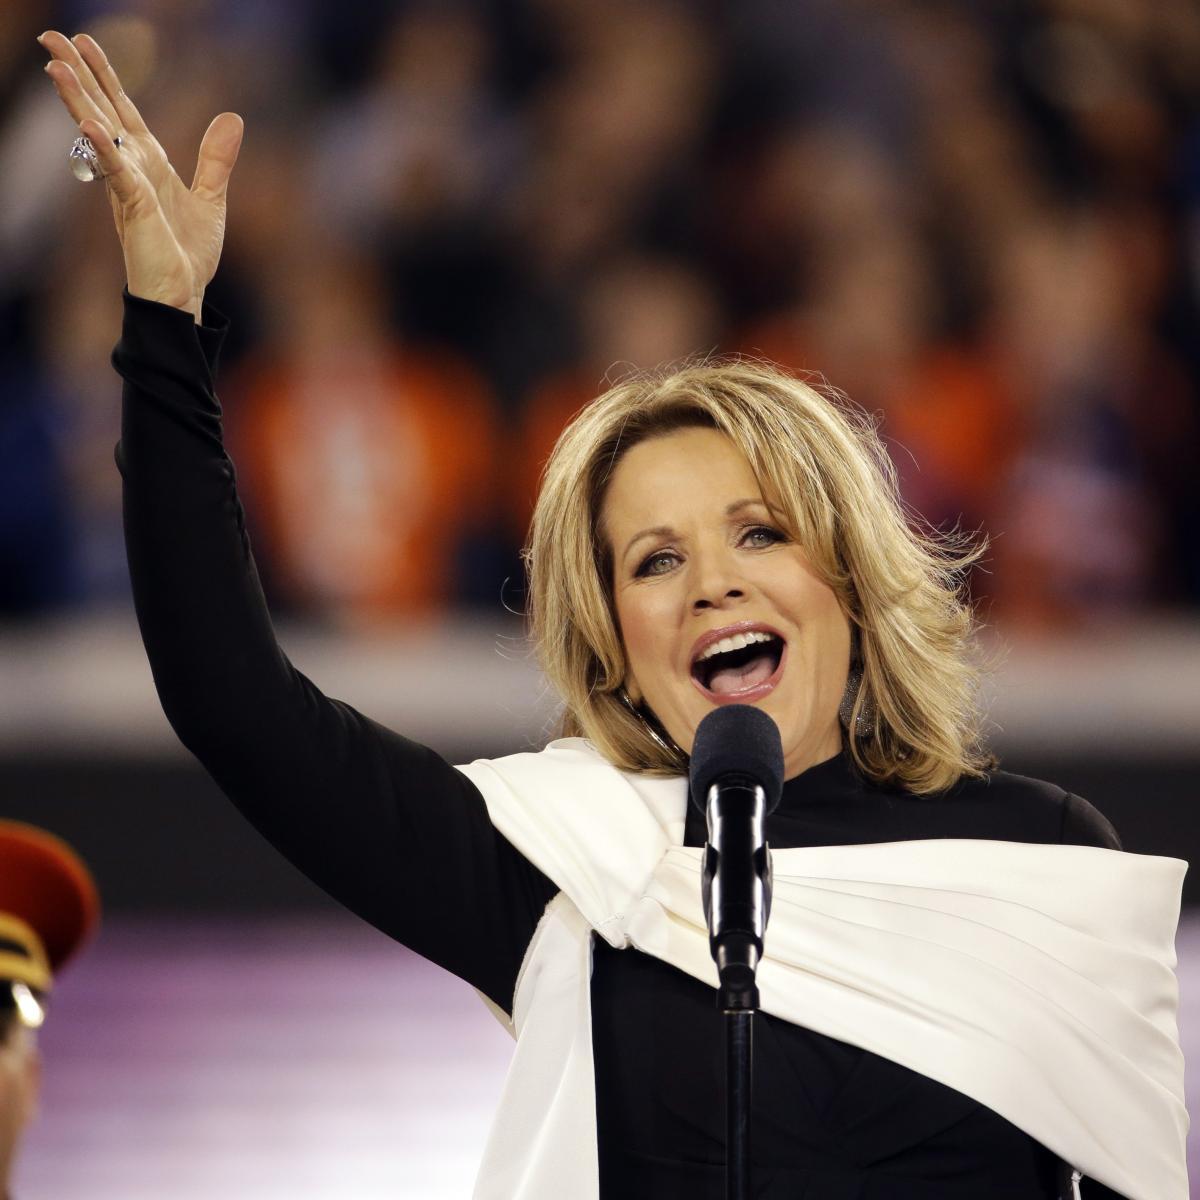 Gatorade Super Bowl Towel: Super Bowl XLIX Props: Coin Toss, Gatorade And National